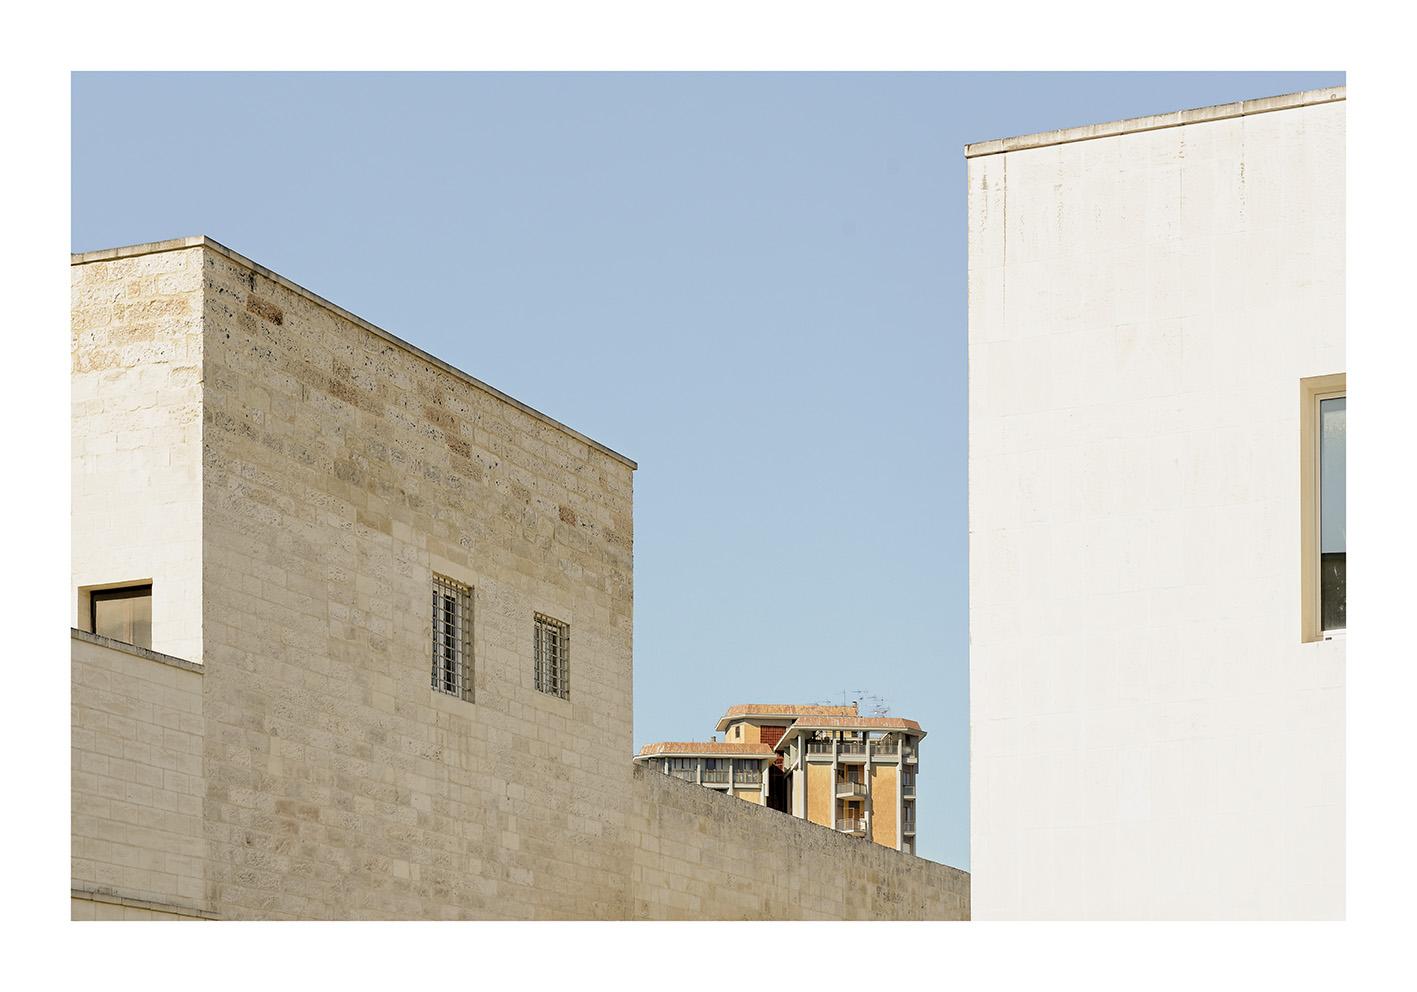 Franco-Sortini-Un-luogo-neutro-livin_art-fotografia3